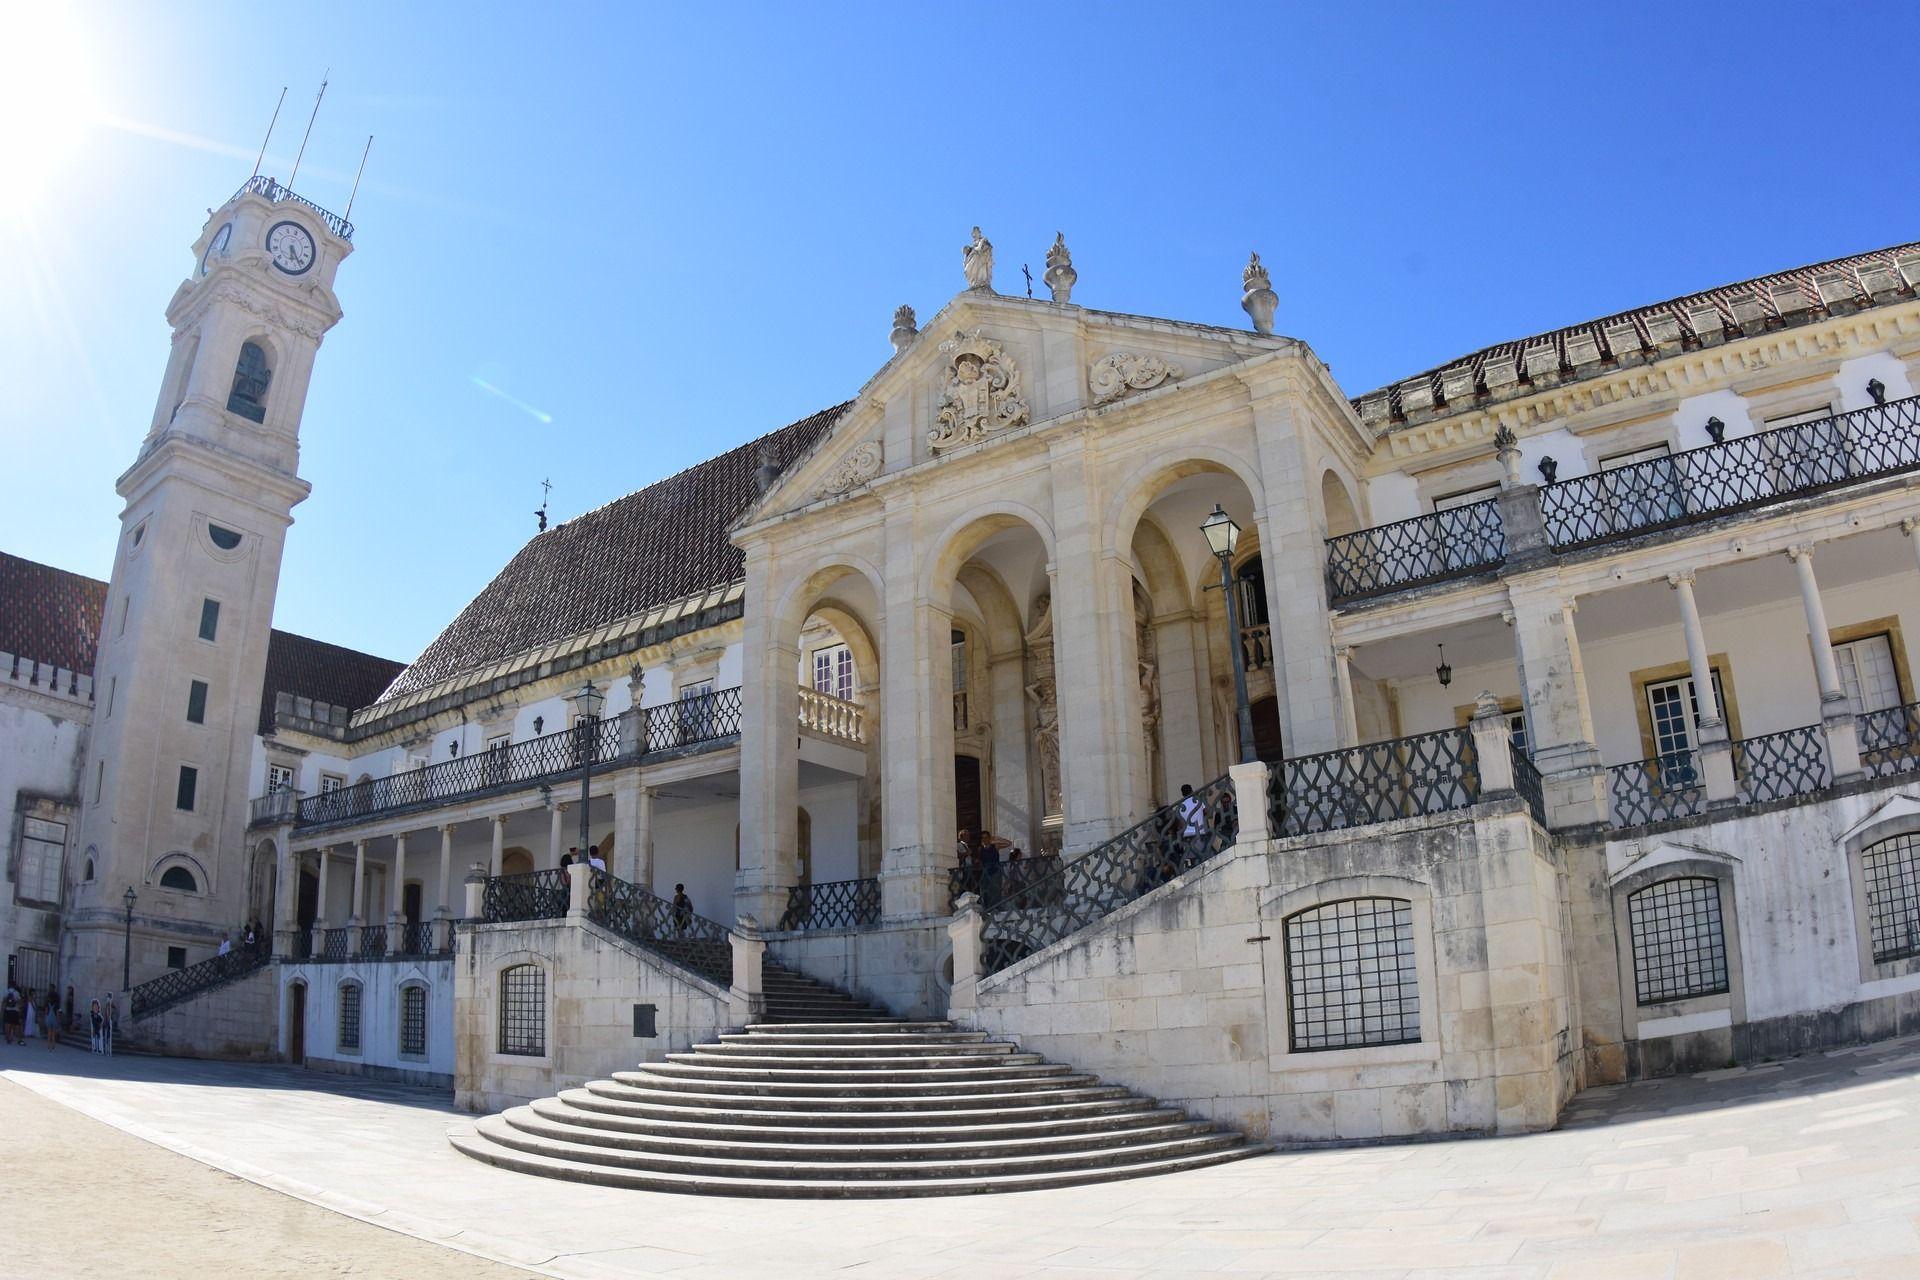 Portugal – Coimbra & University